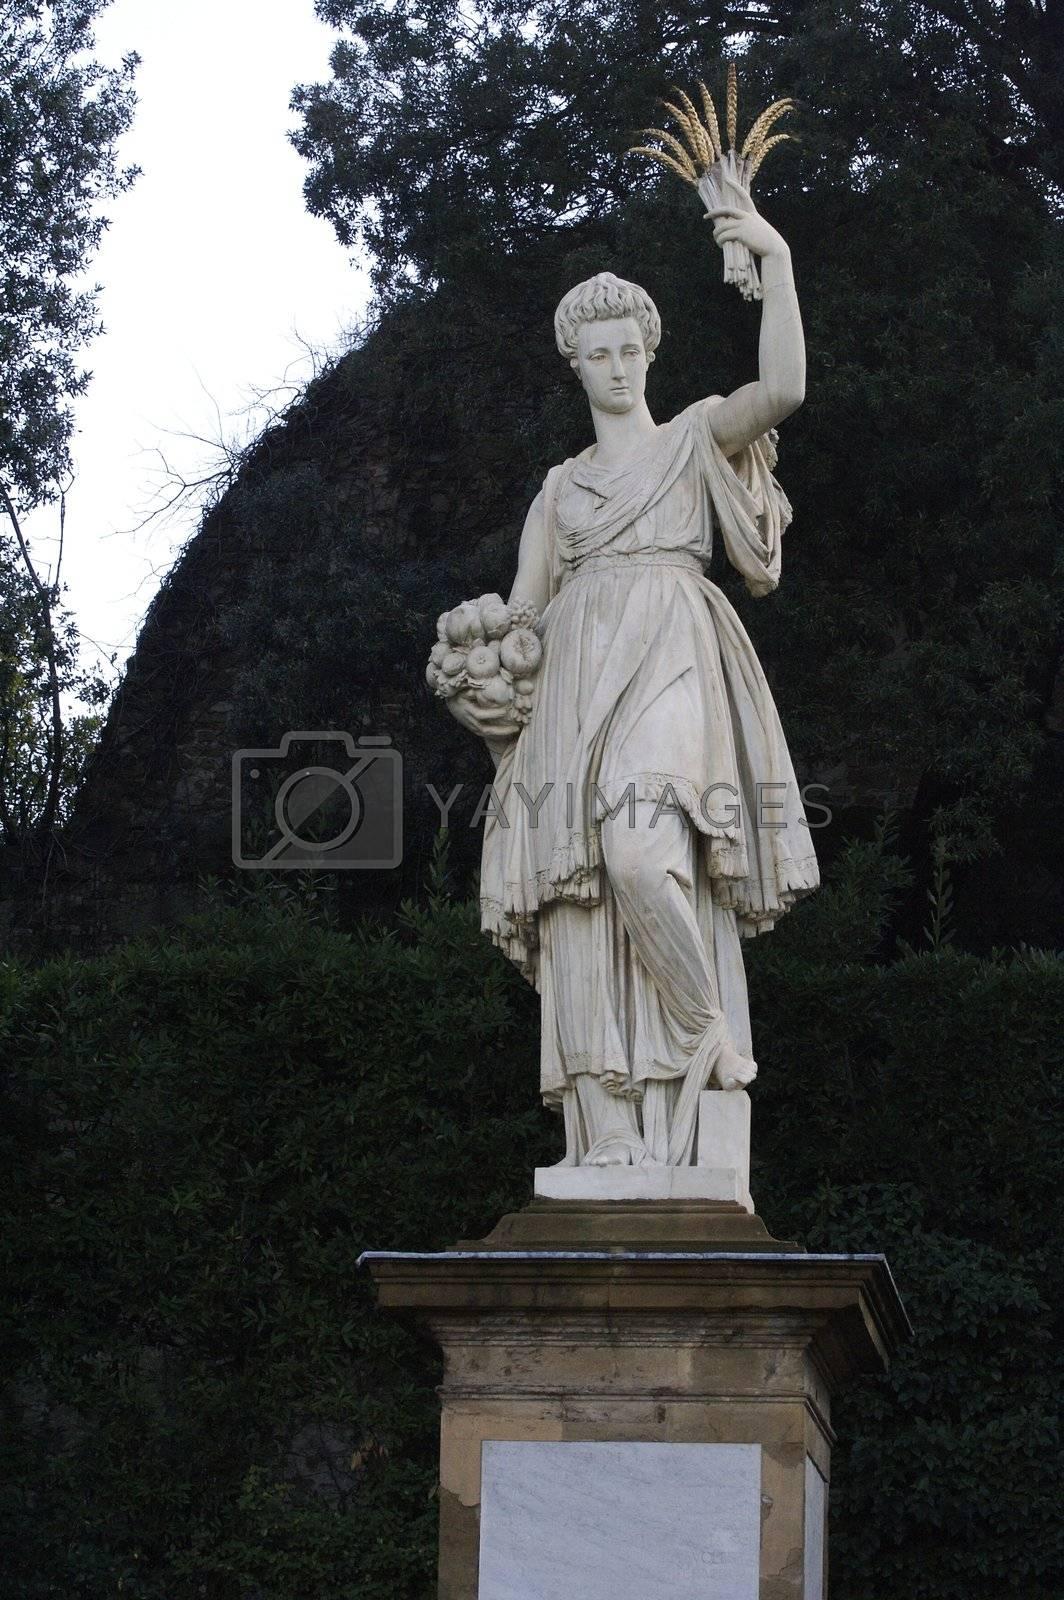 Royalty free image of Italian goddess of fertility by janza